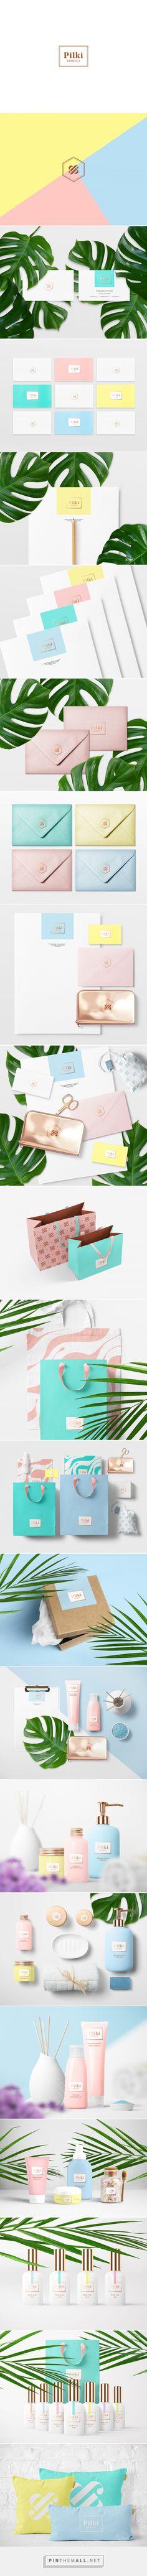 Pilki Nail Care Salon Branding and Packaging by Rina Rusyaeva | Fivestar Branding – Design and Branding Agency & Inspiration Gallery